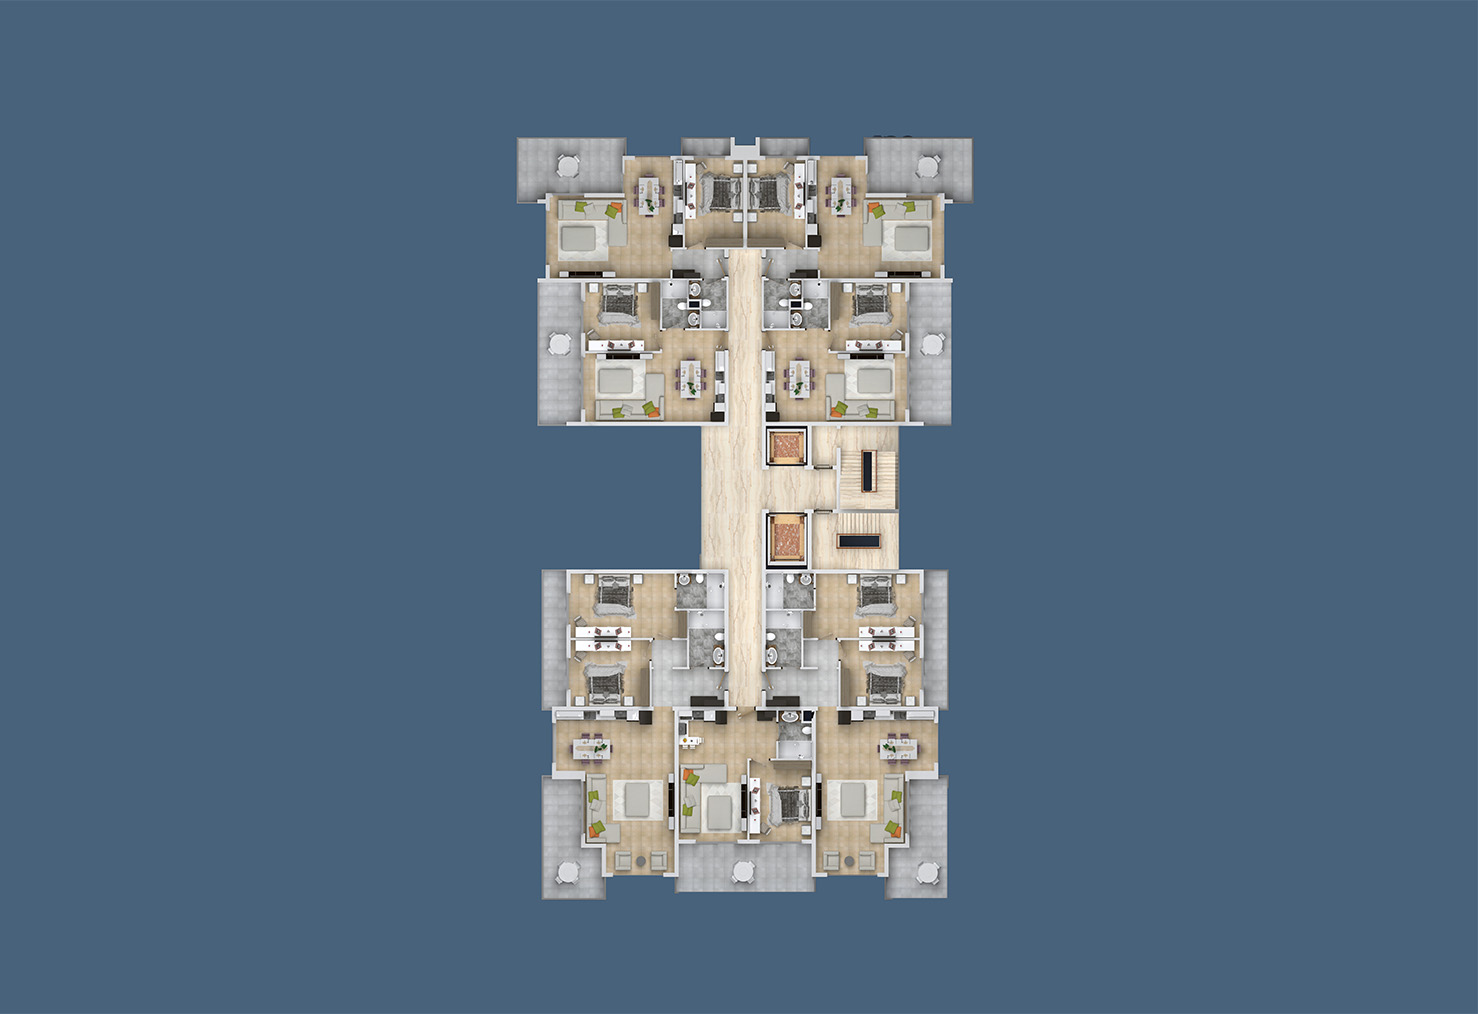 Floor plans of apartments 10 floor «A» Yekta Kingdom Trade Center